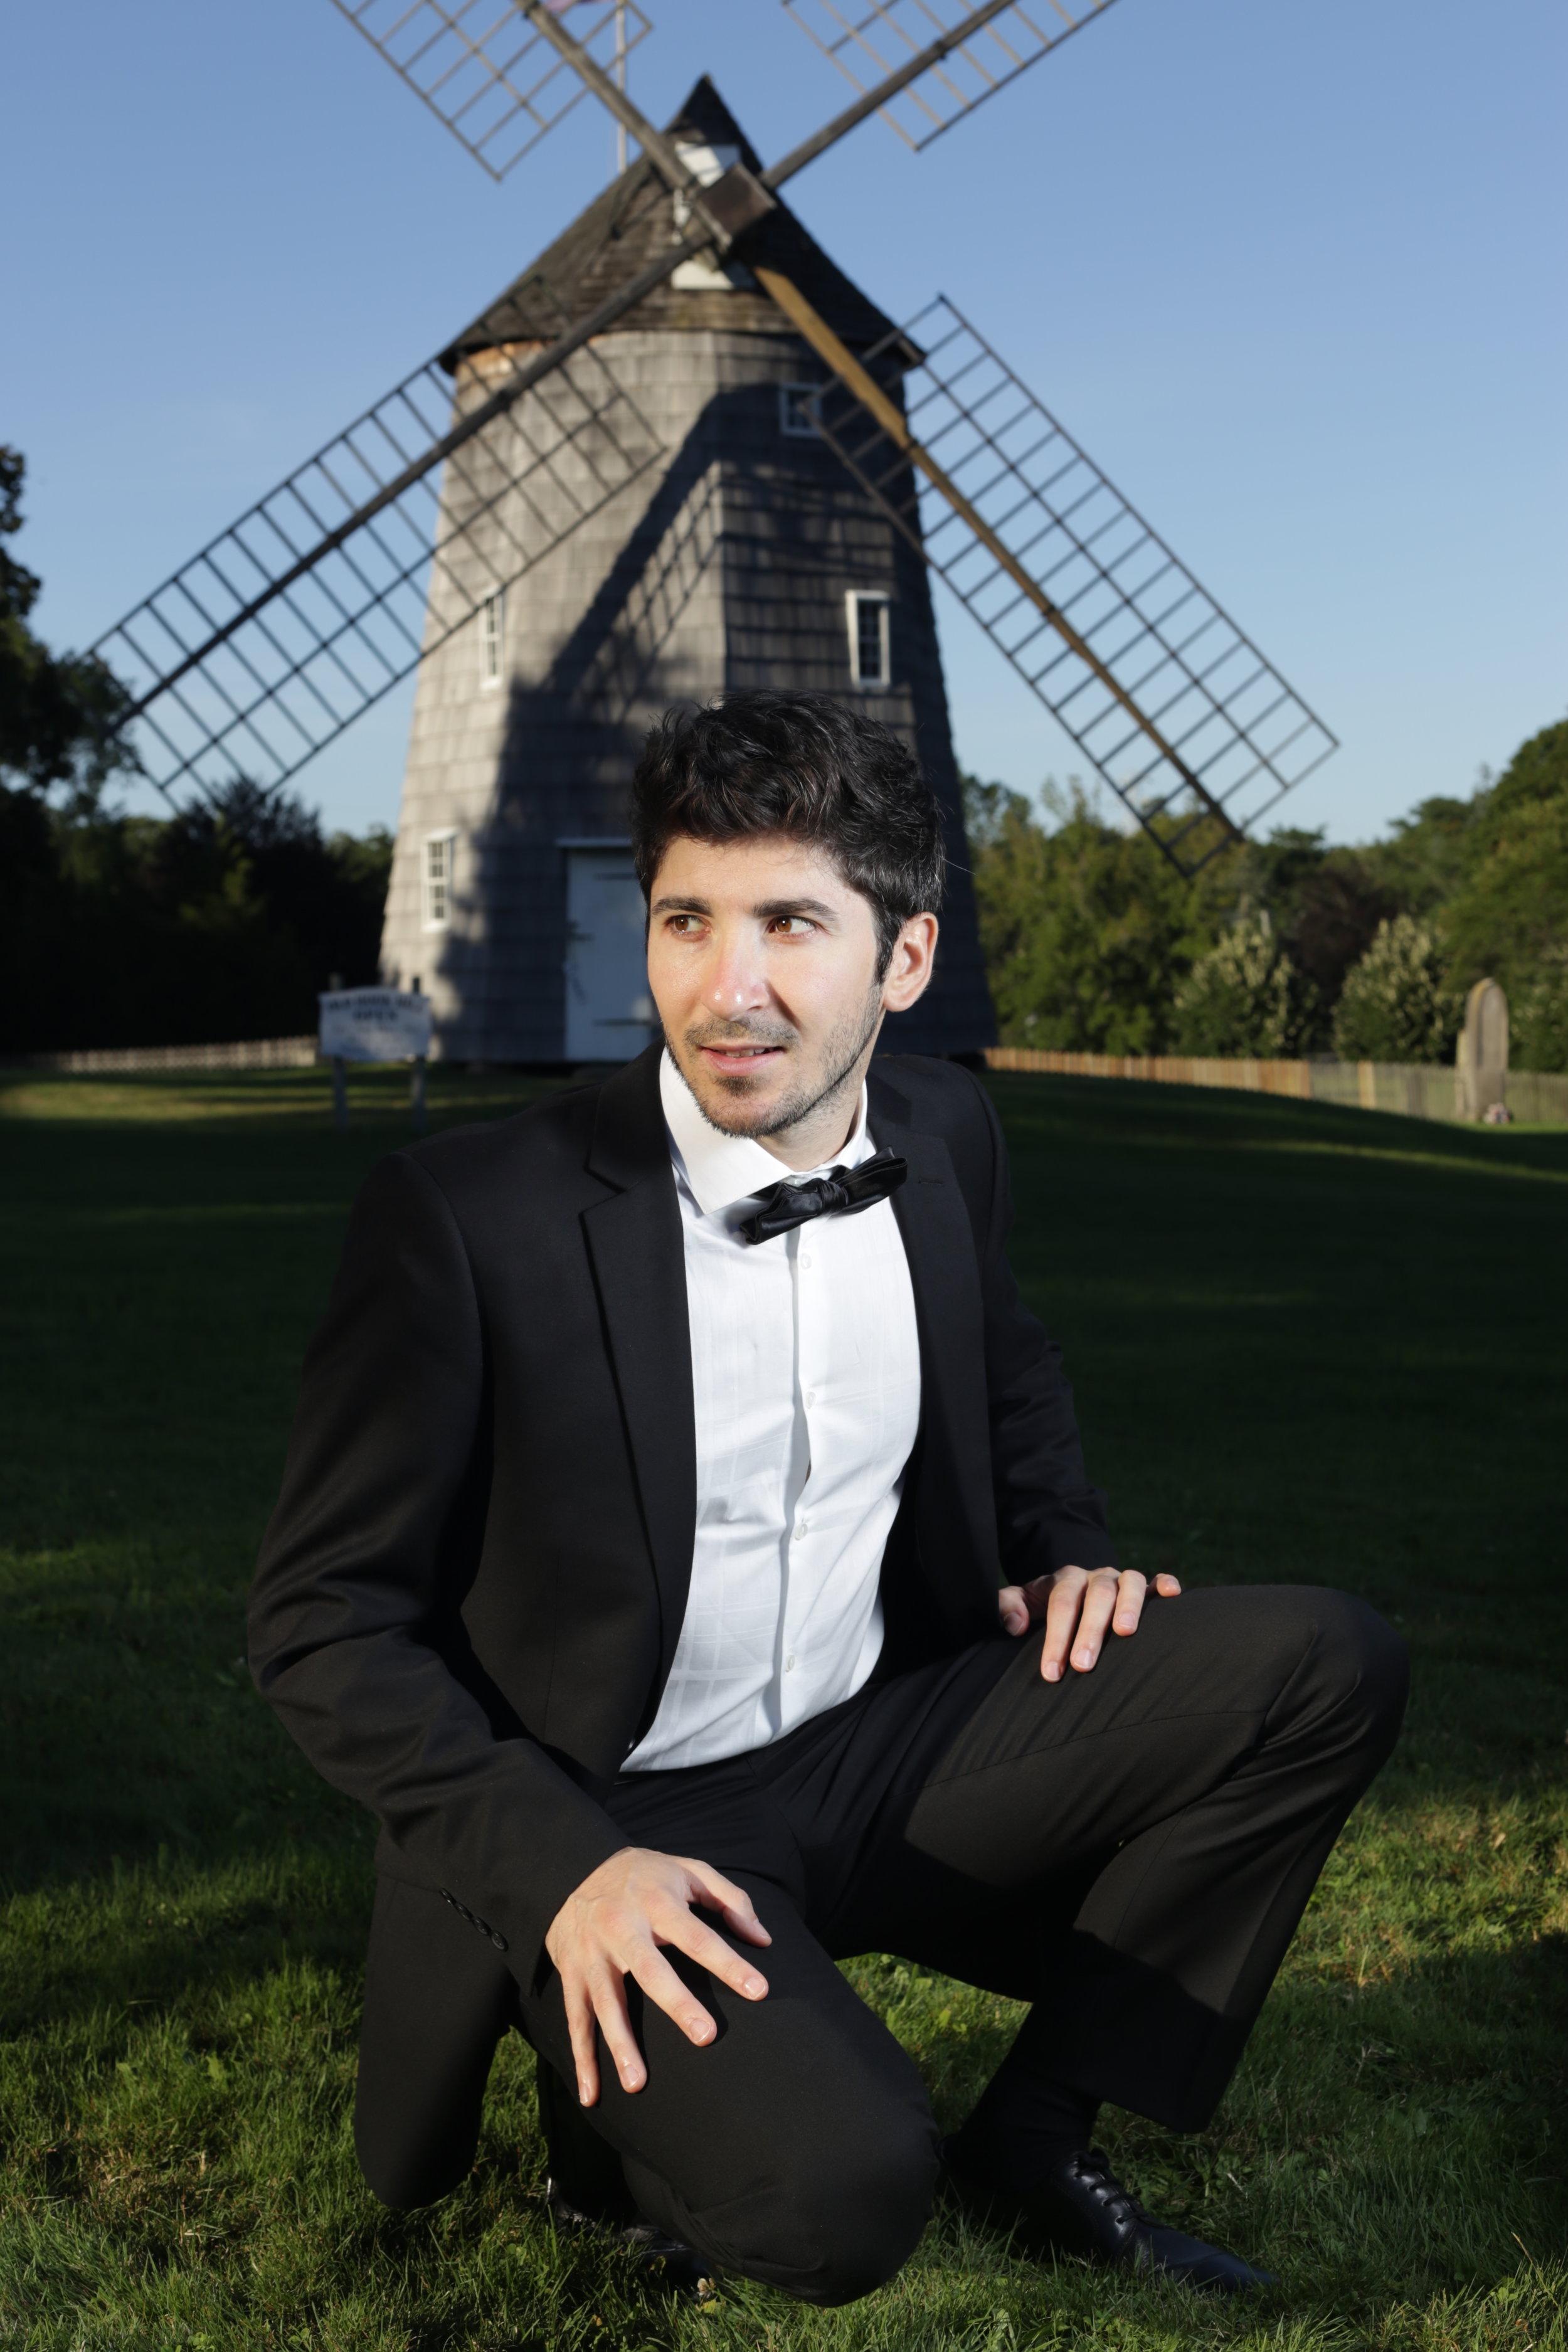 Niccolò Ronchi, pianist